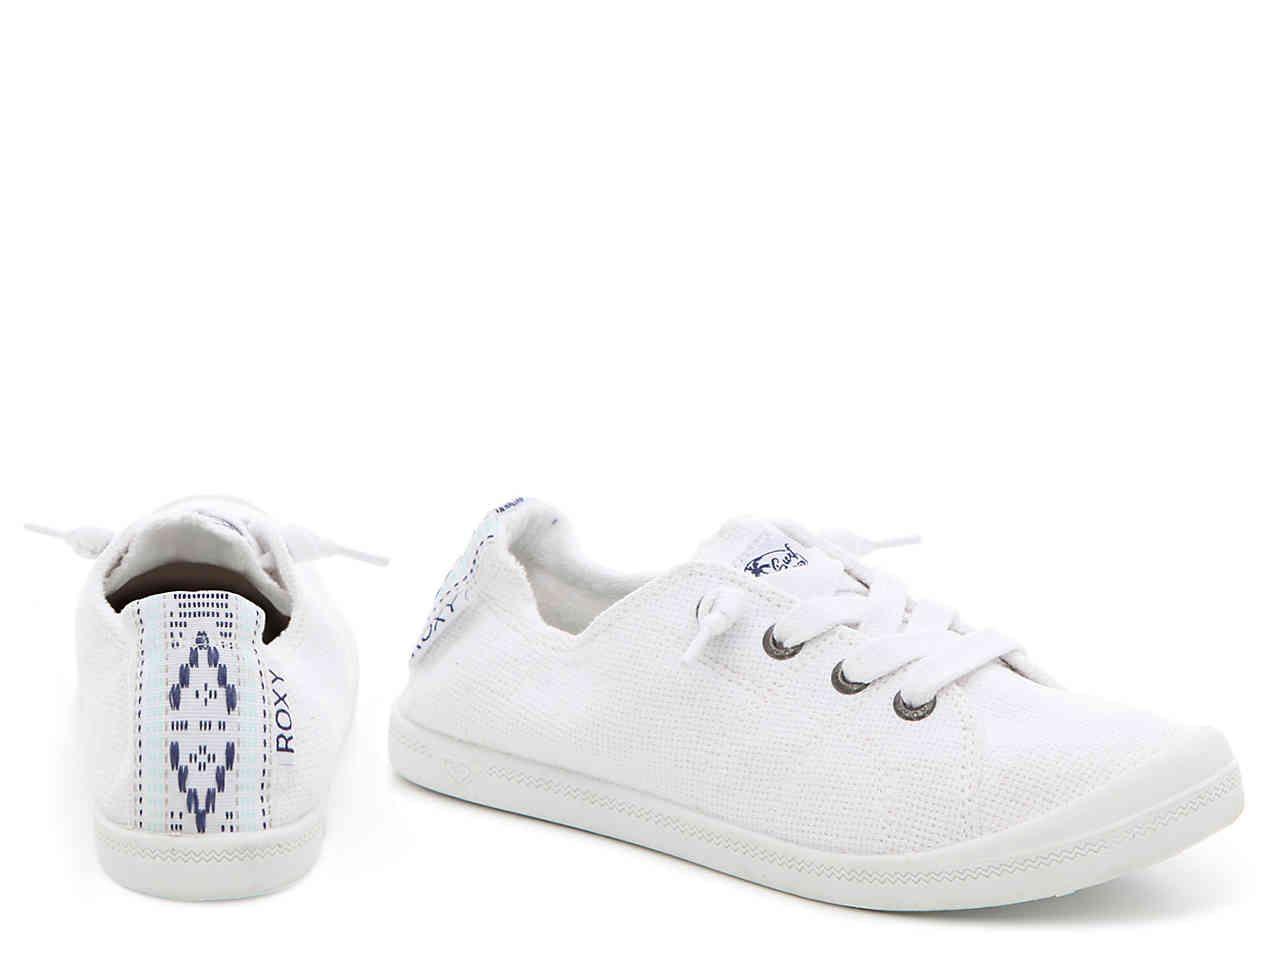 Bayshore Sneaker   Sneakers, Roxy shoes